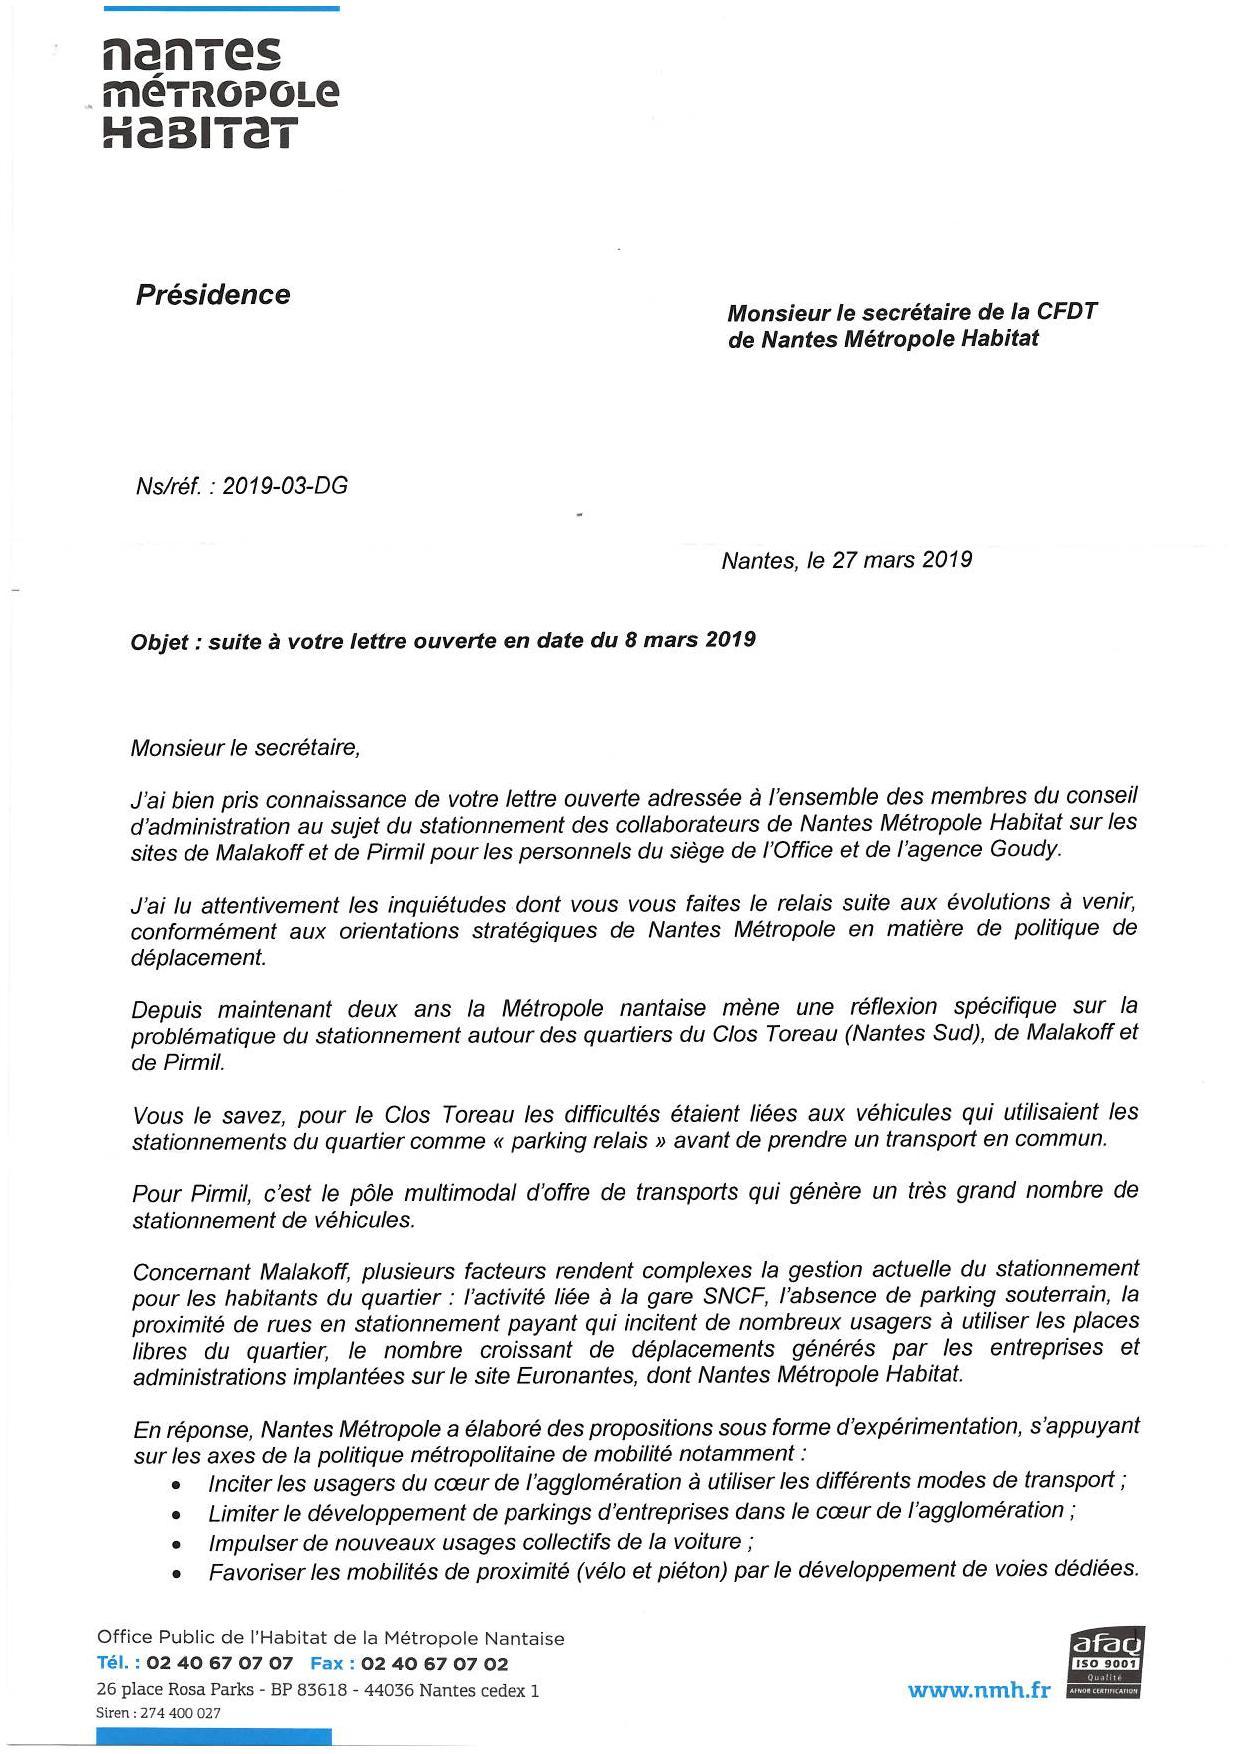 lettre ouverte administrative